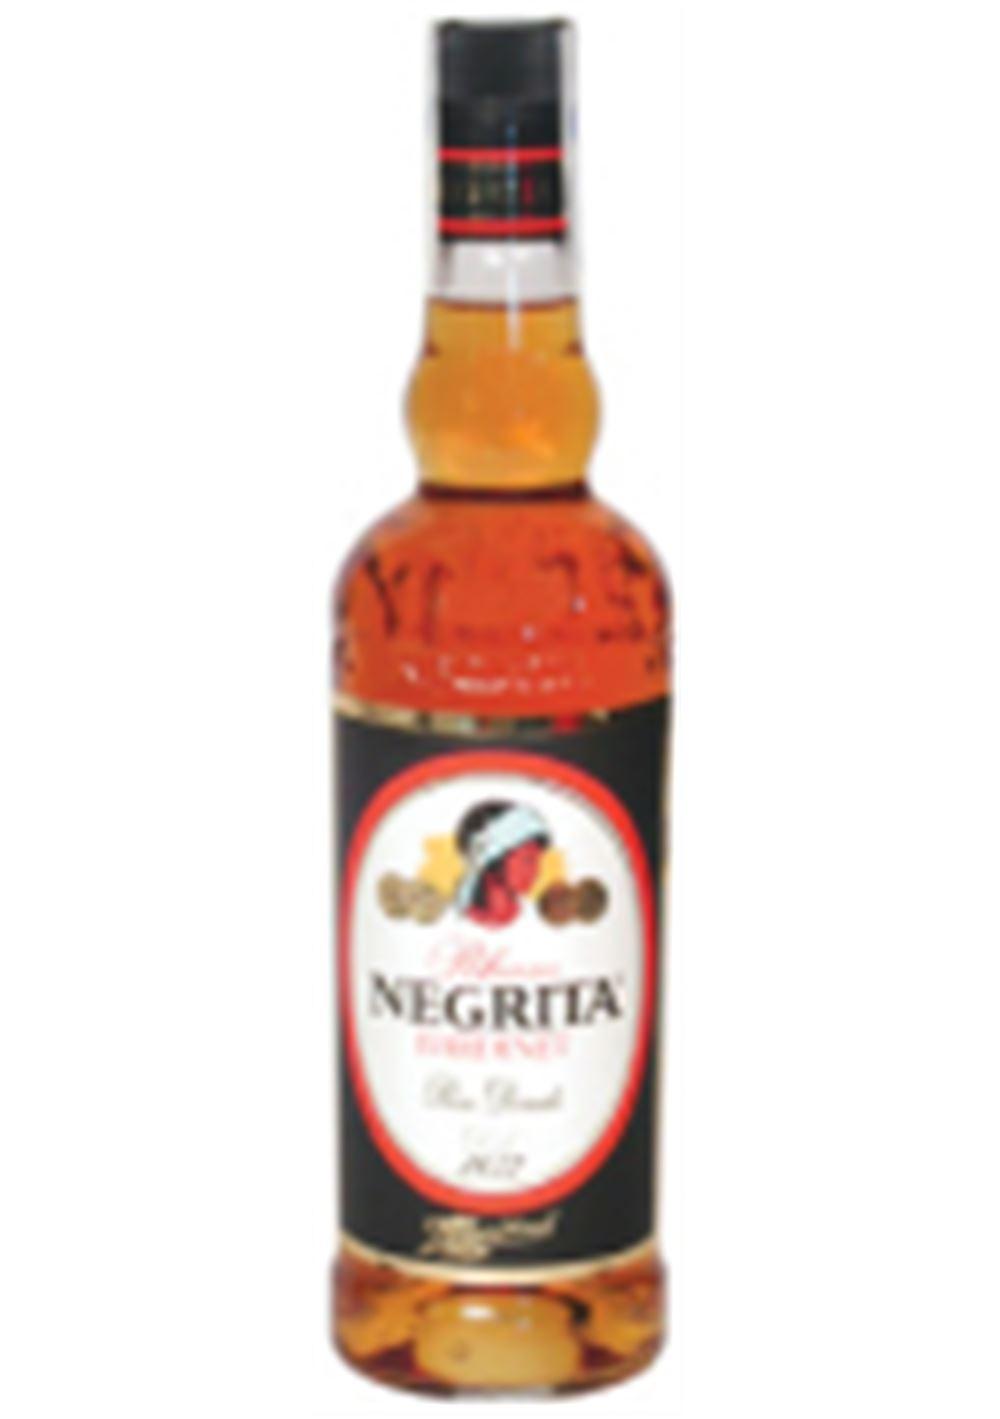 NEGRITA B